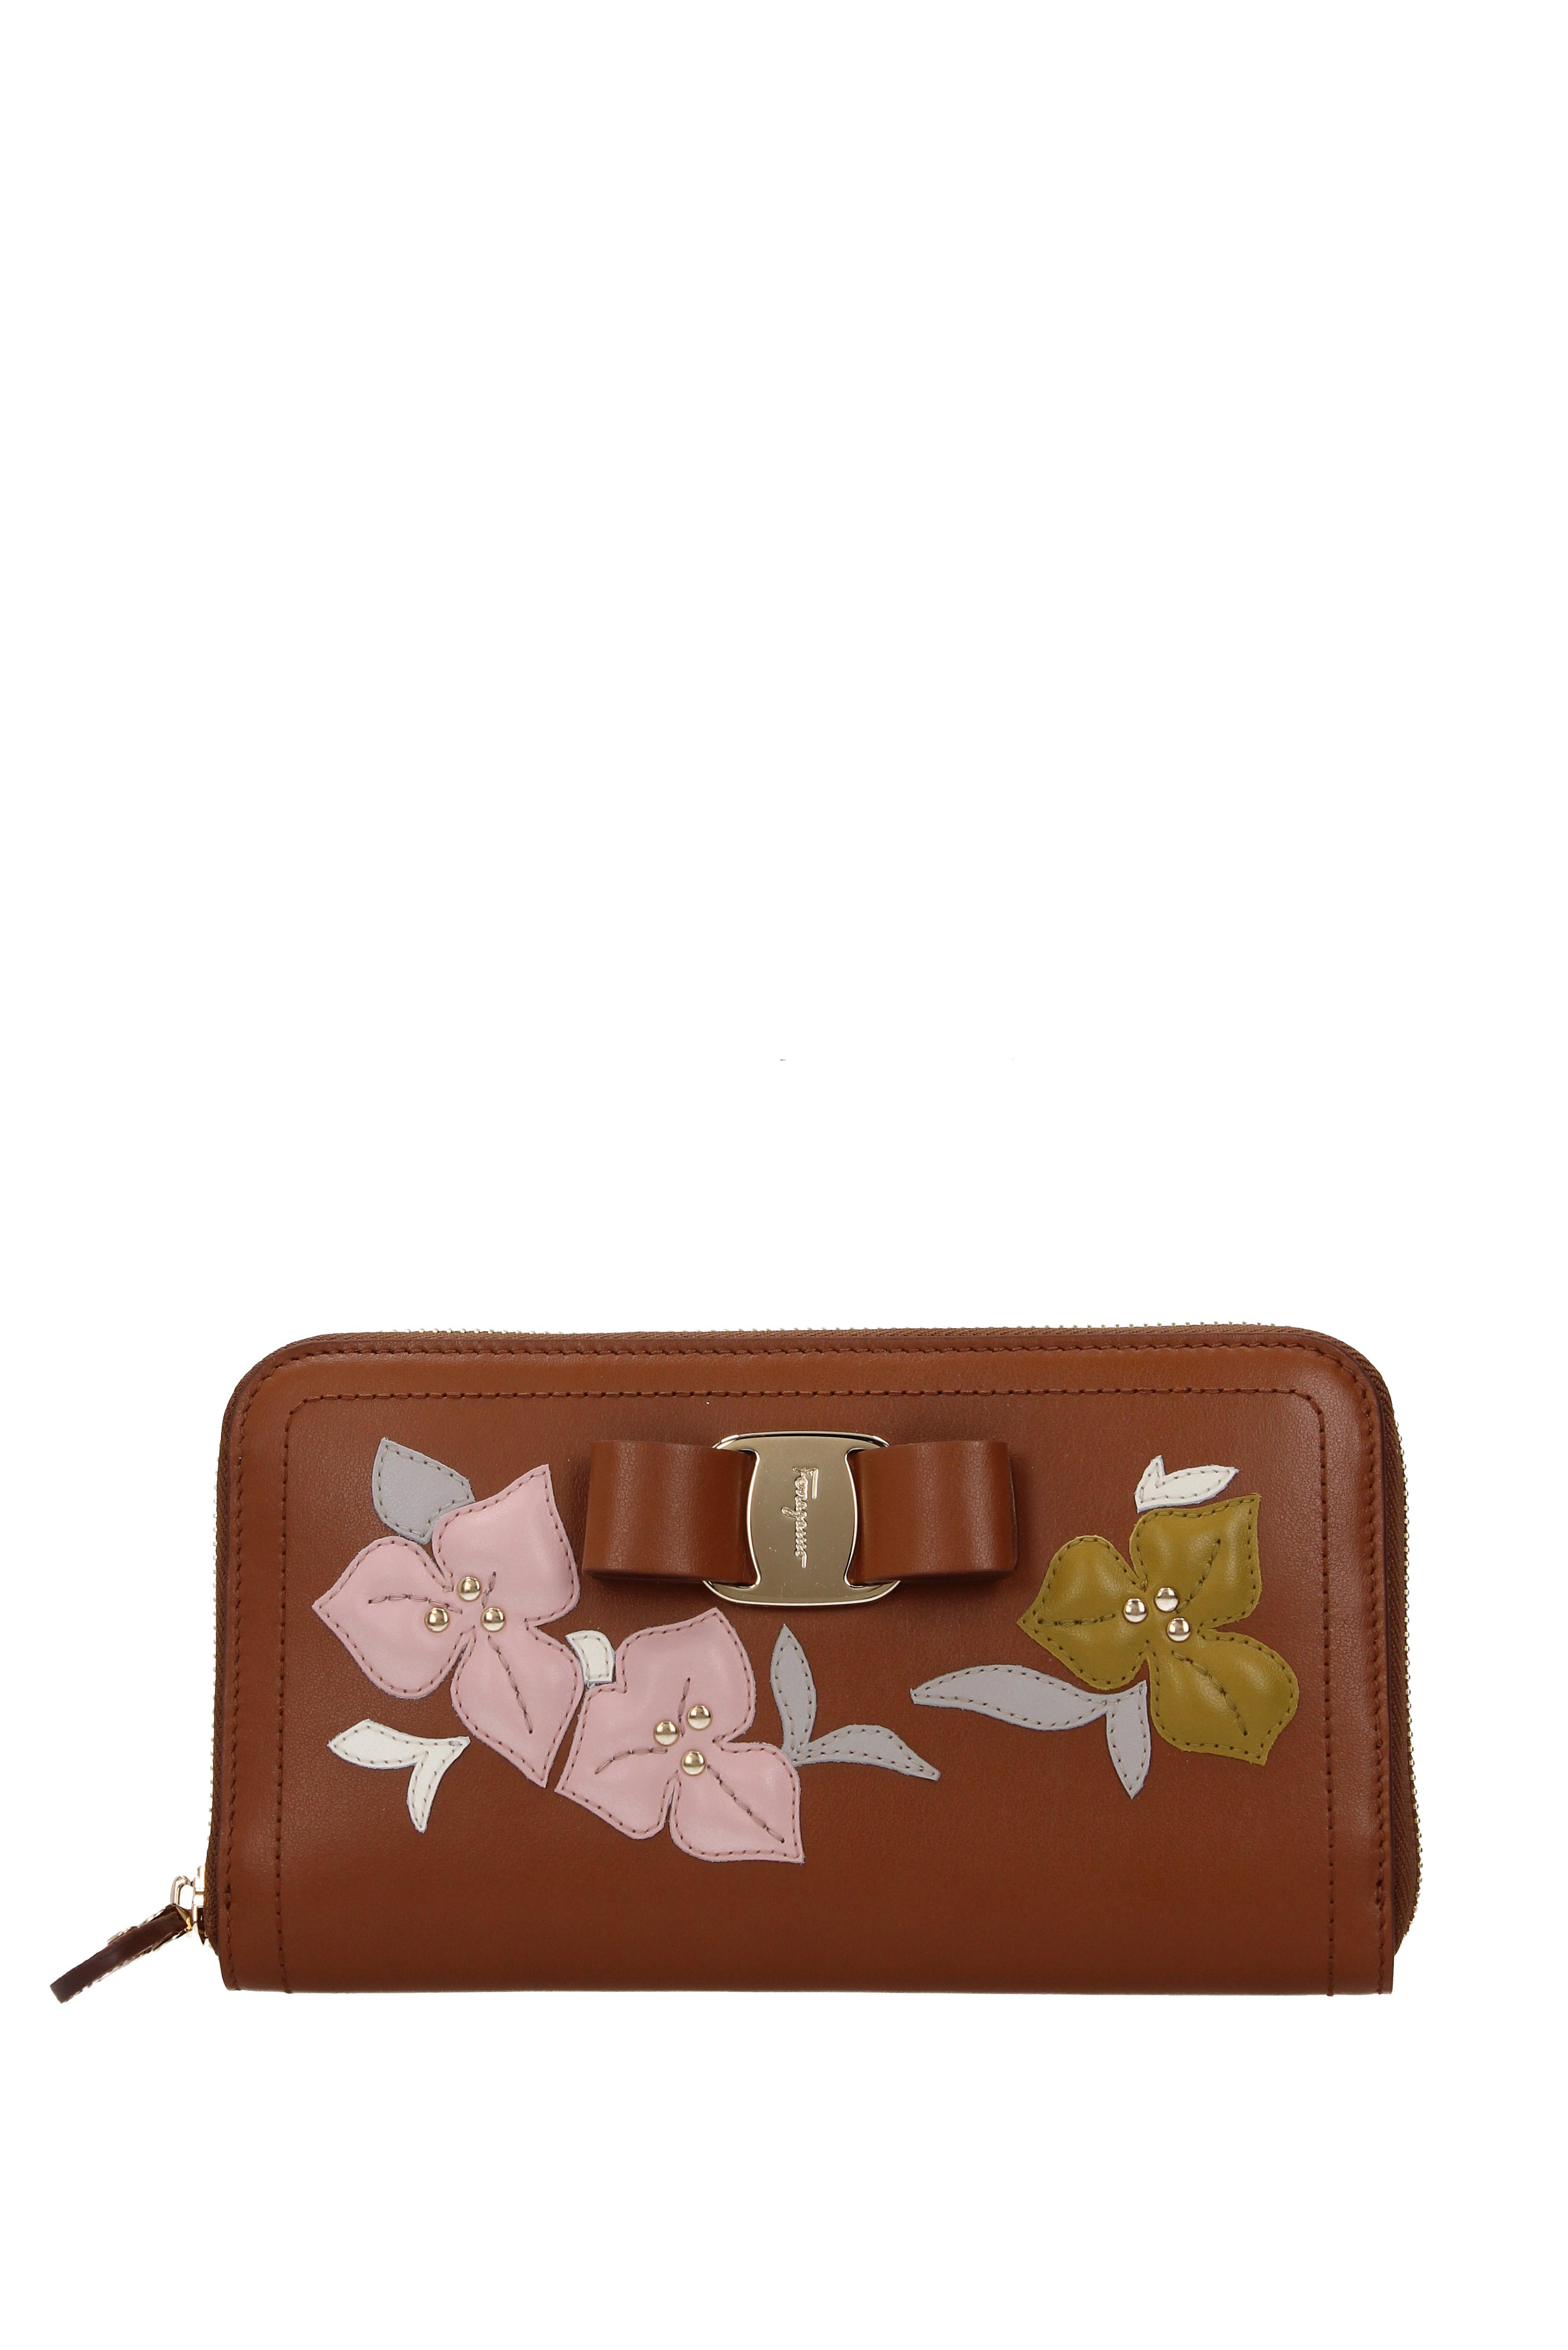 Brieftasche-Salvatore-Ferragamo-Damen-Leder-22C83206679